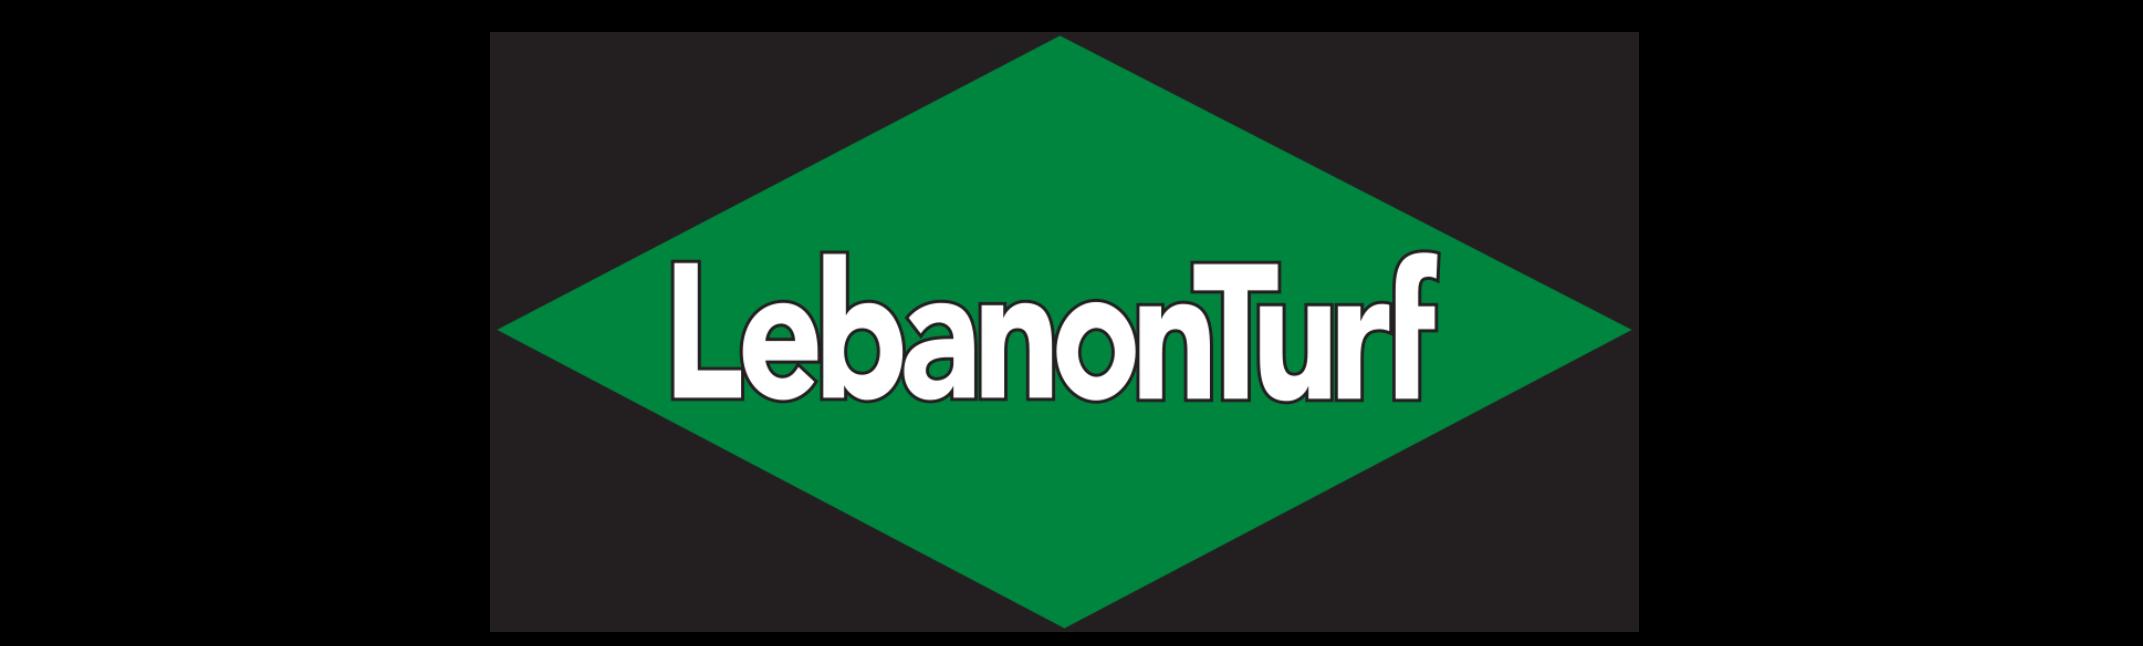 LebanonTurf product catalog | LebanonTurf